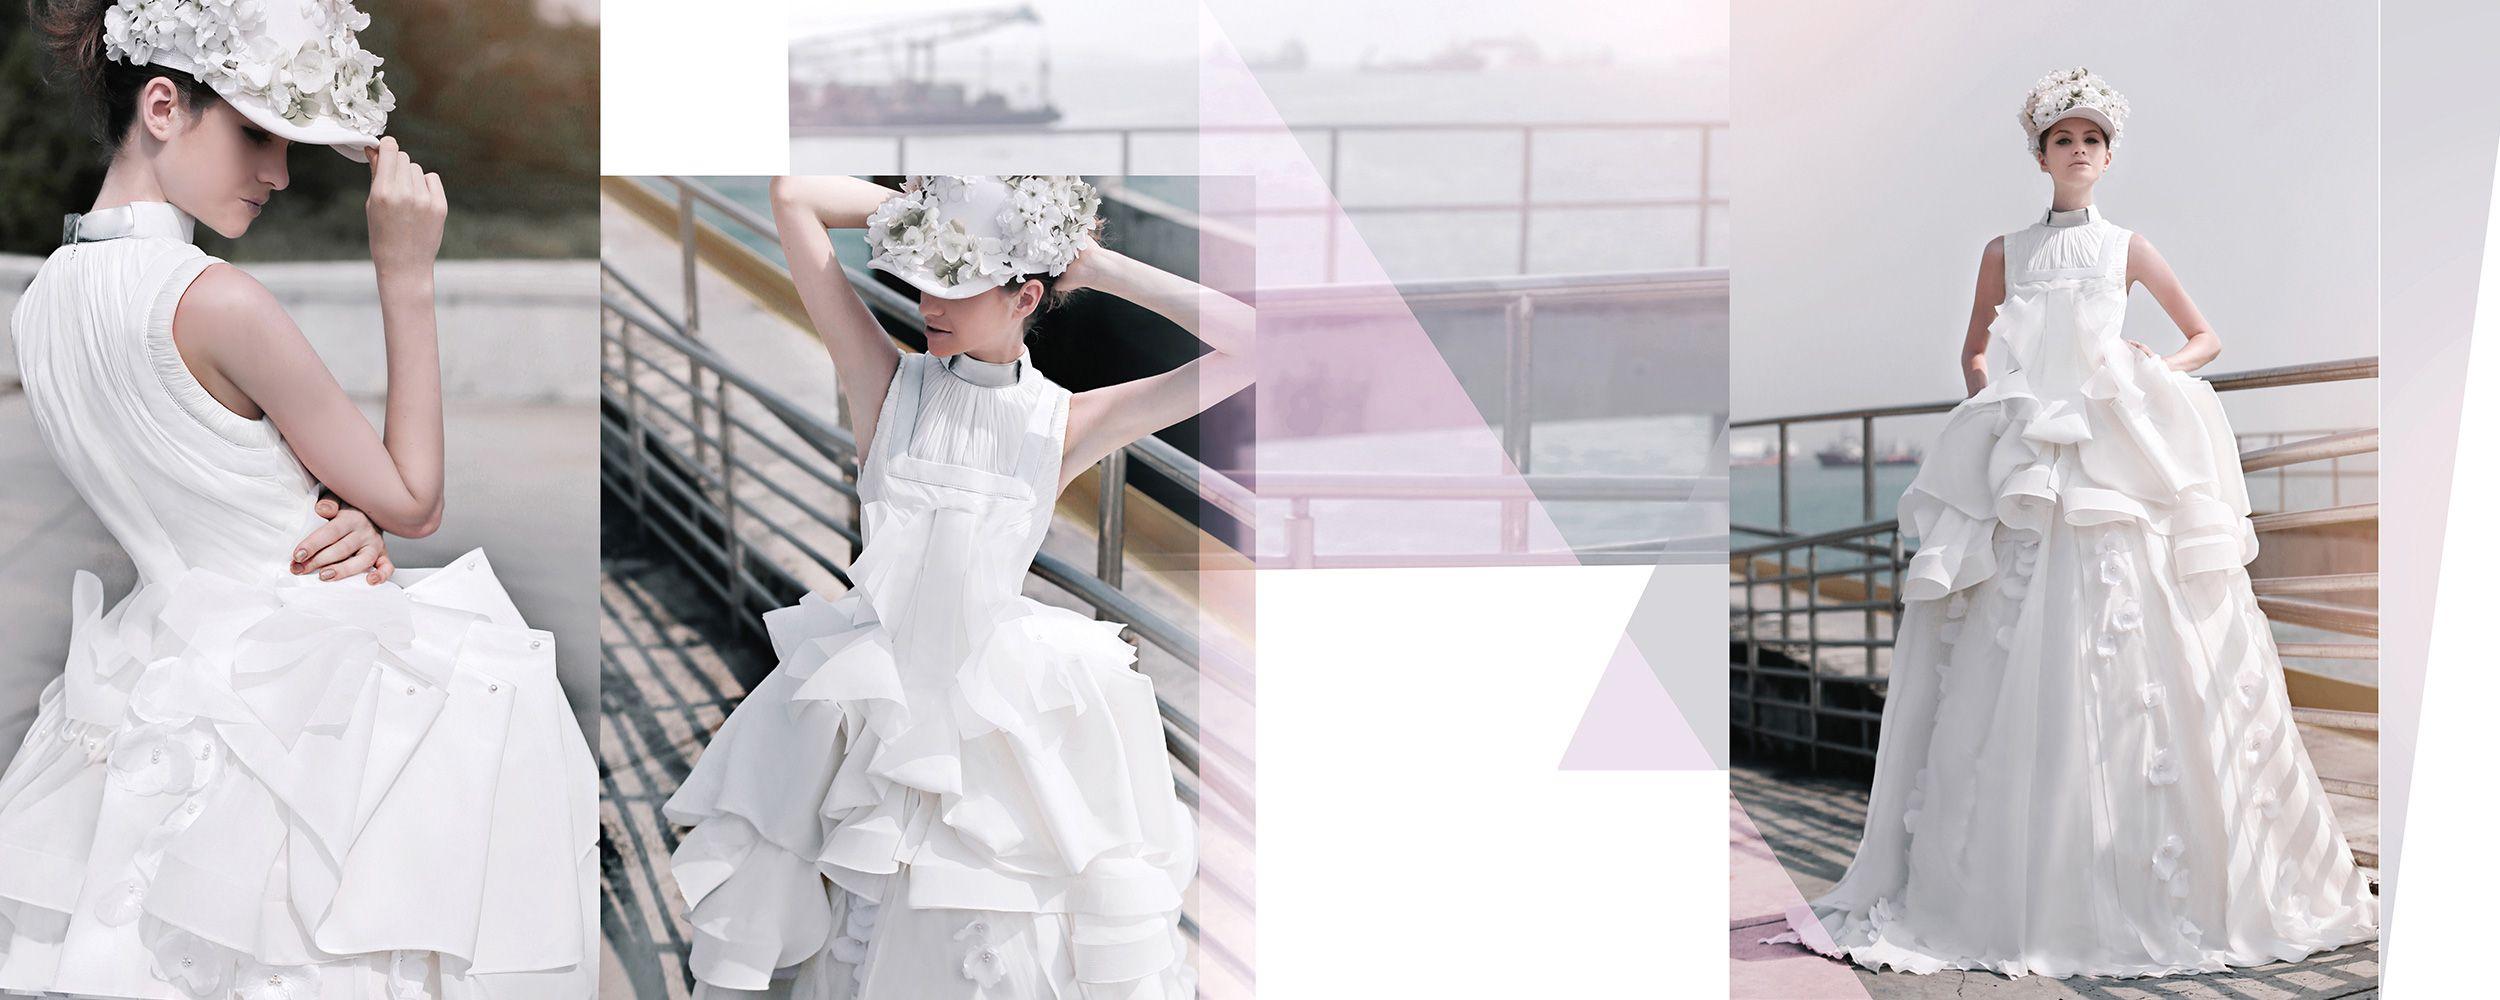 Le Grand Amor Of Atlantis Wedding Collection | Steampunk/Neo ...